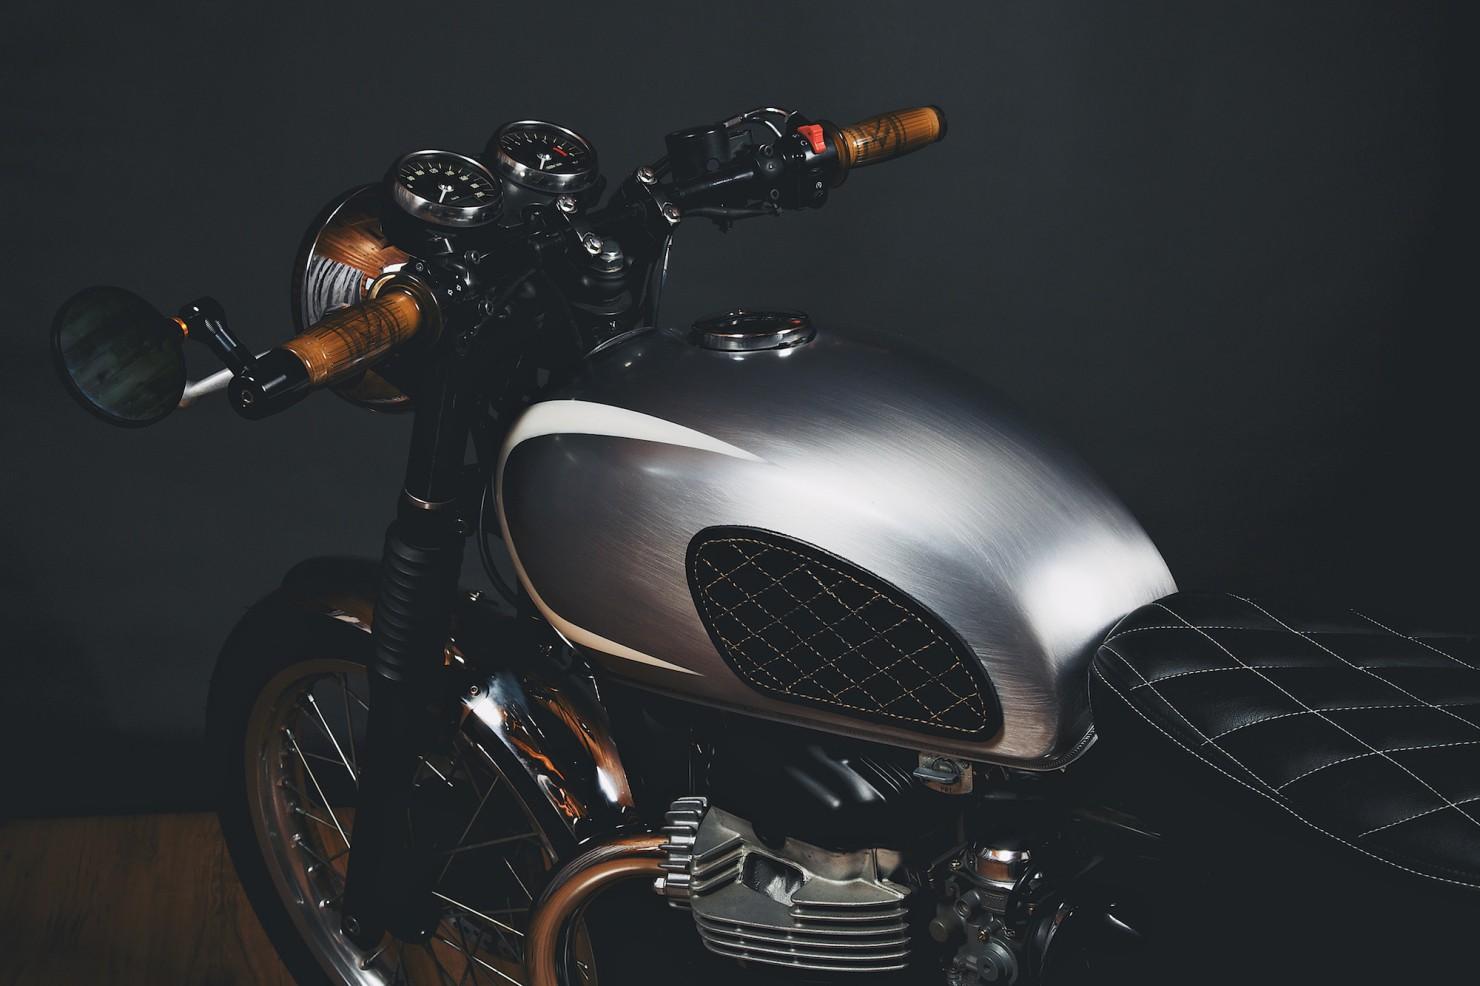 Kawasaki W650 Motorcycle 3 1480x986 Kawasaki W650